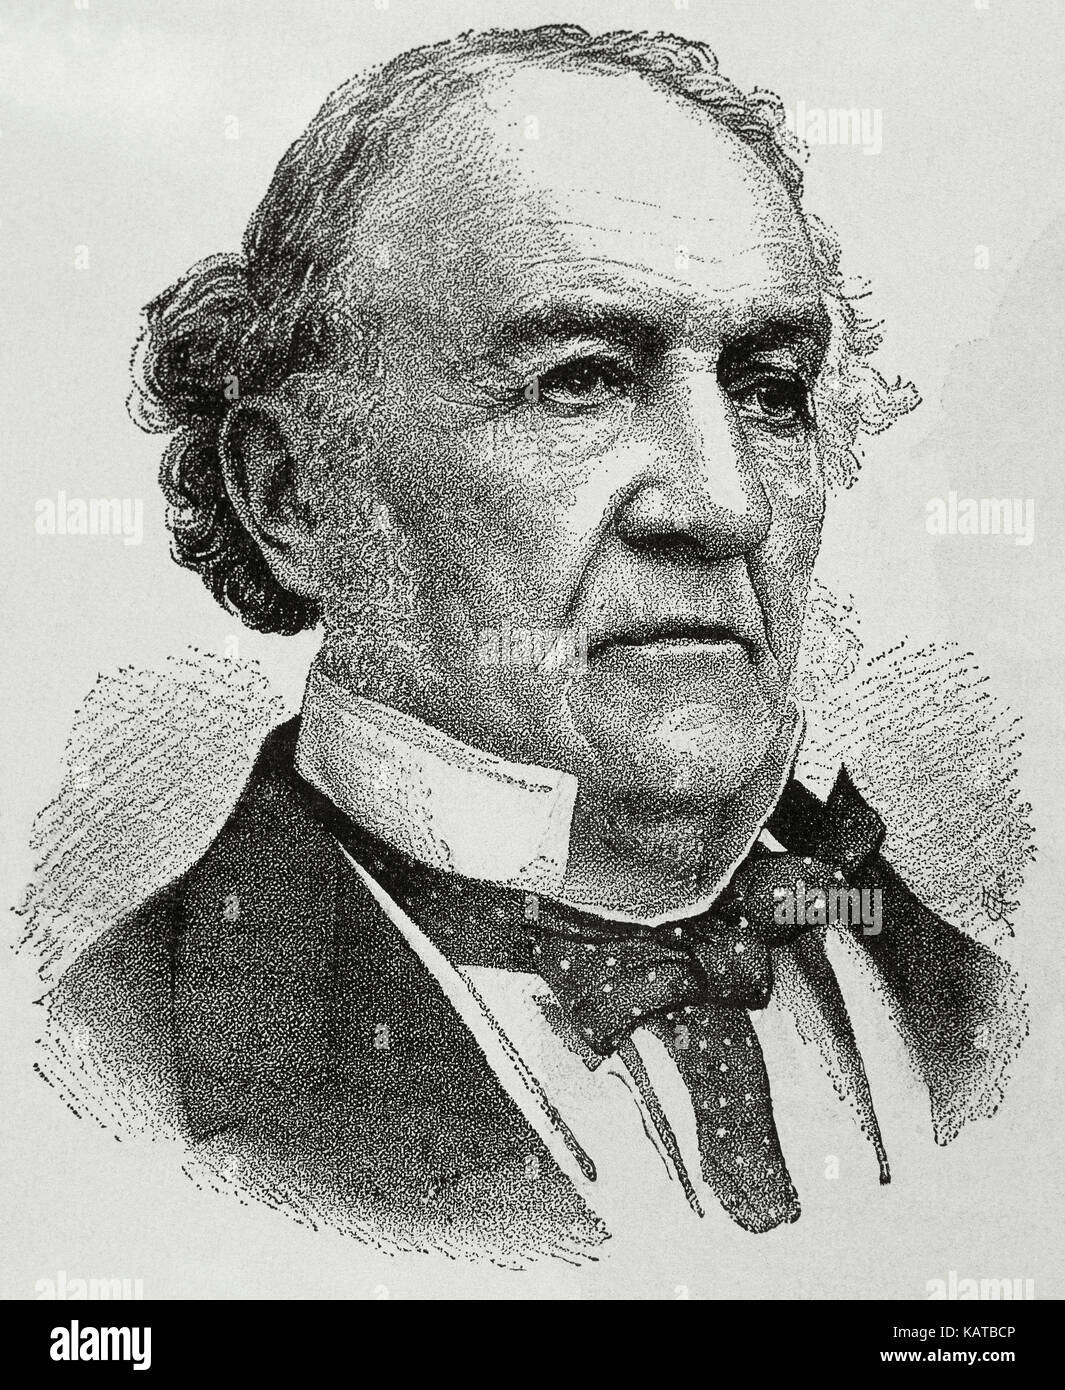 William Ewart Gladstone (1809-1898). British Liberal statesman. Portrait. Engraving. Stock Photo